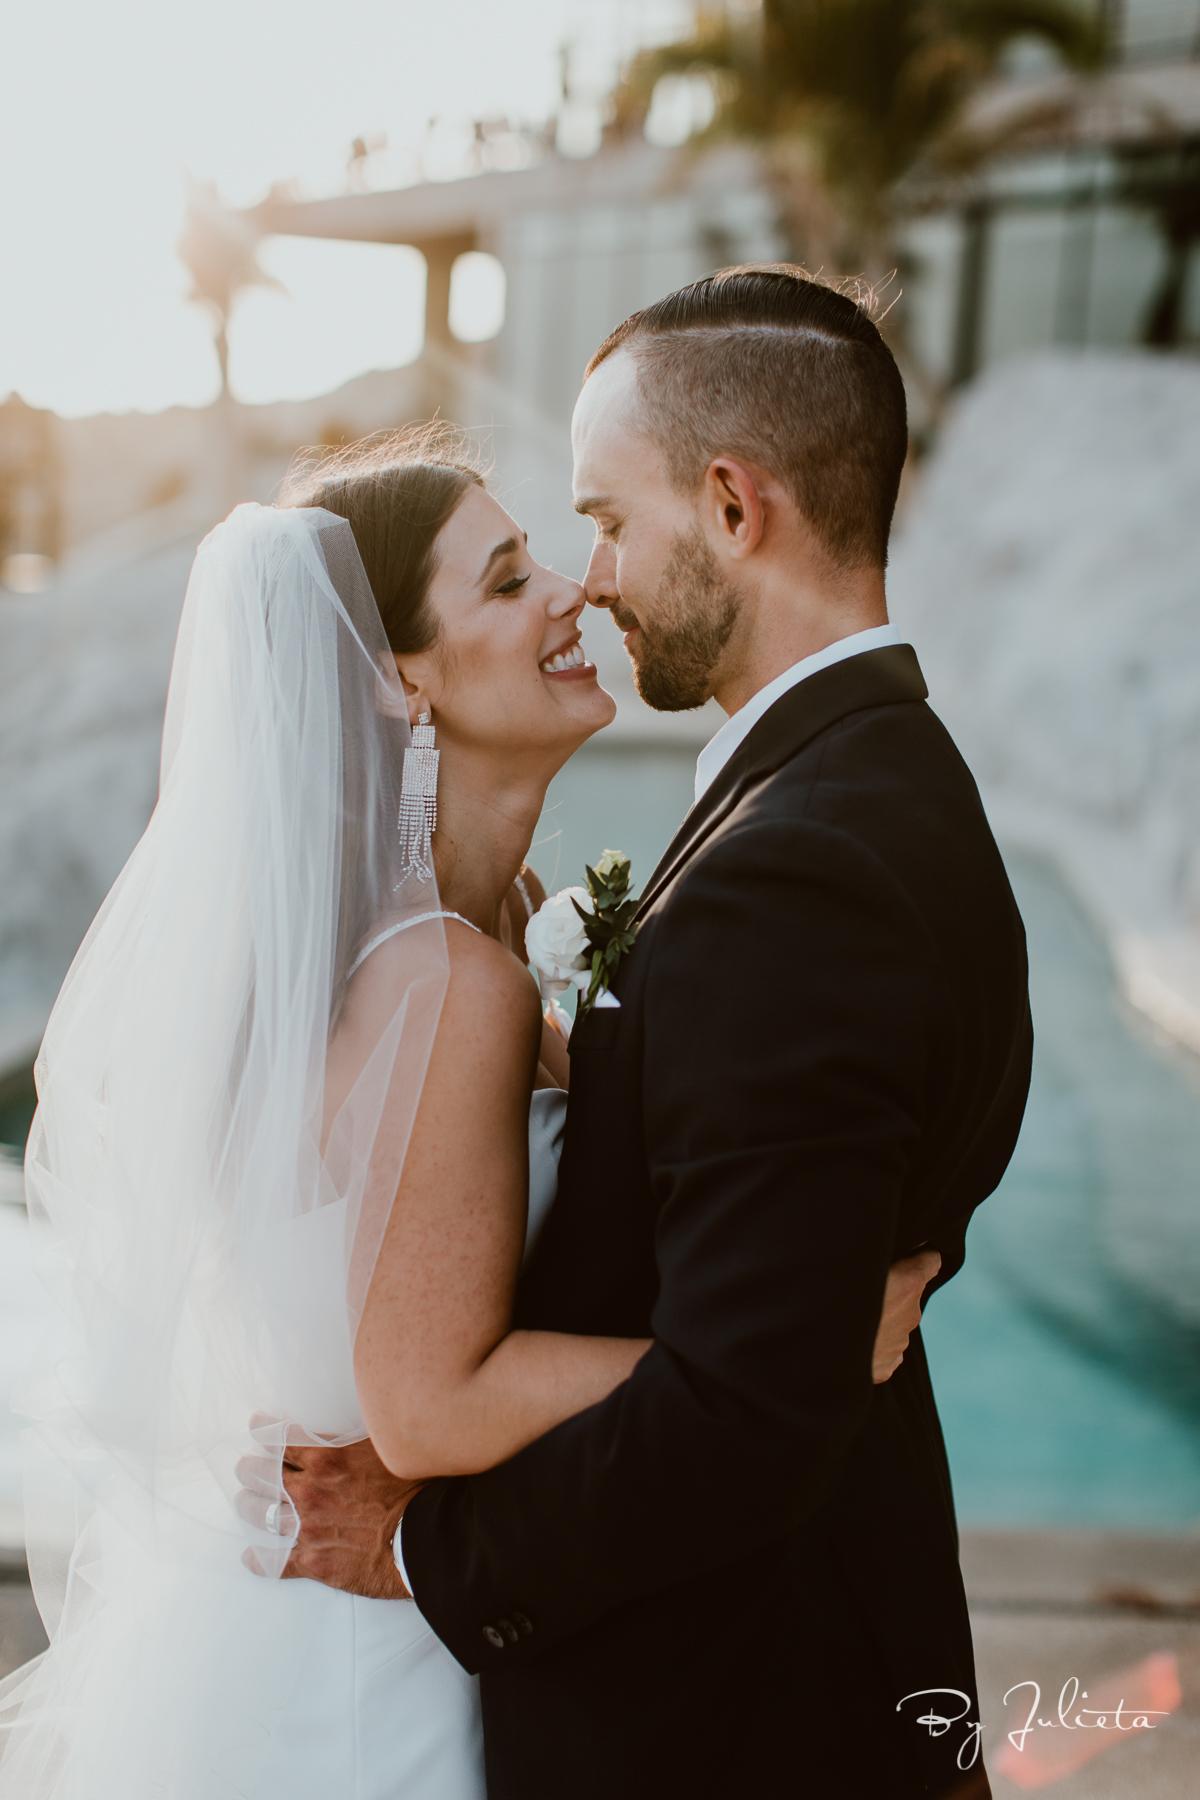 WeddingTheCapeCabo.B+G.JulietaAmezcuaPhotography.(399of533).jpg